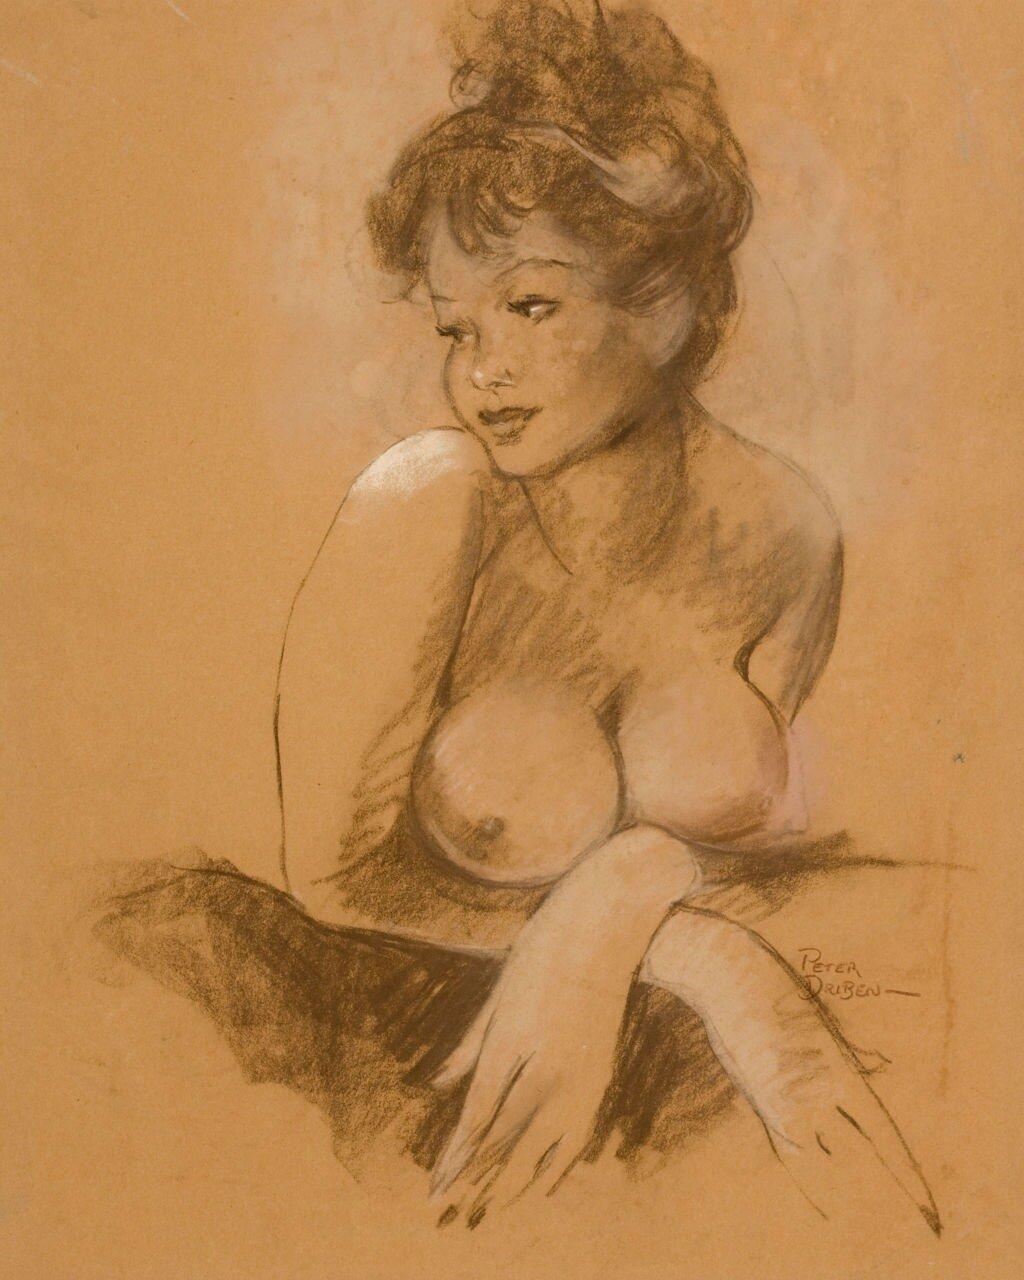 Peter Driben. Female nude study